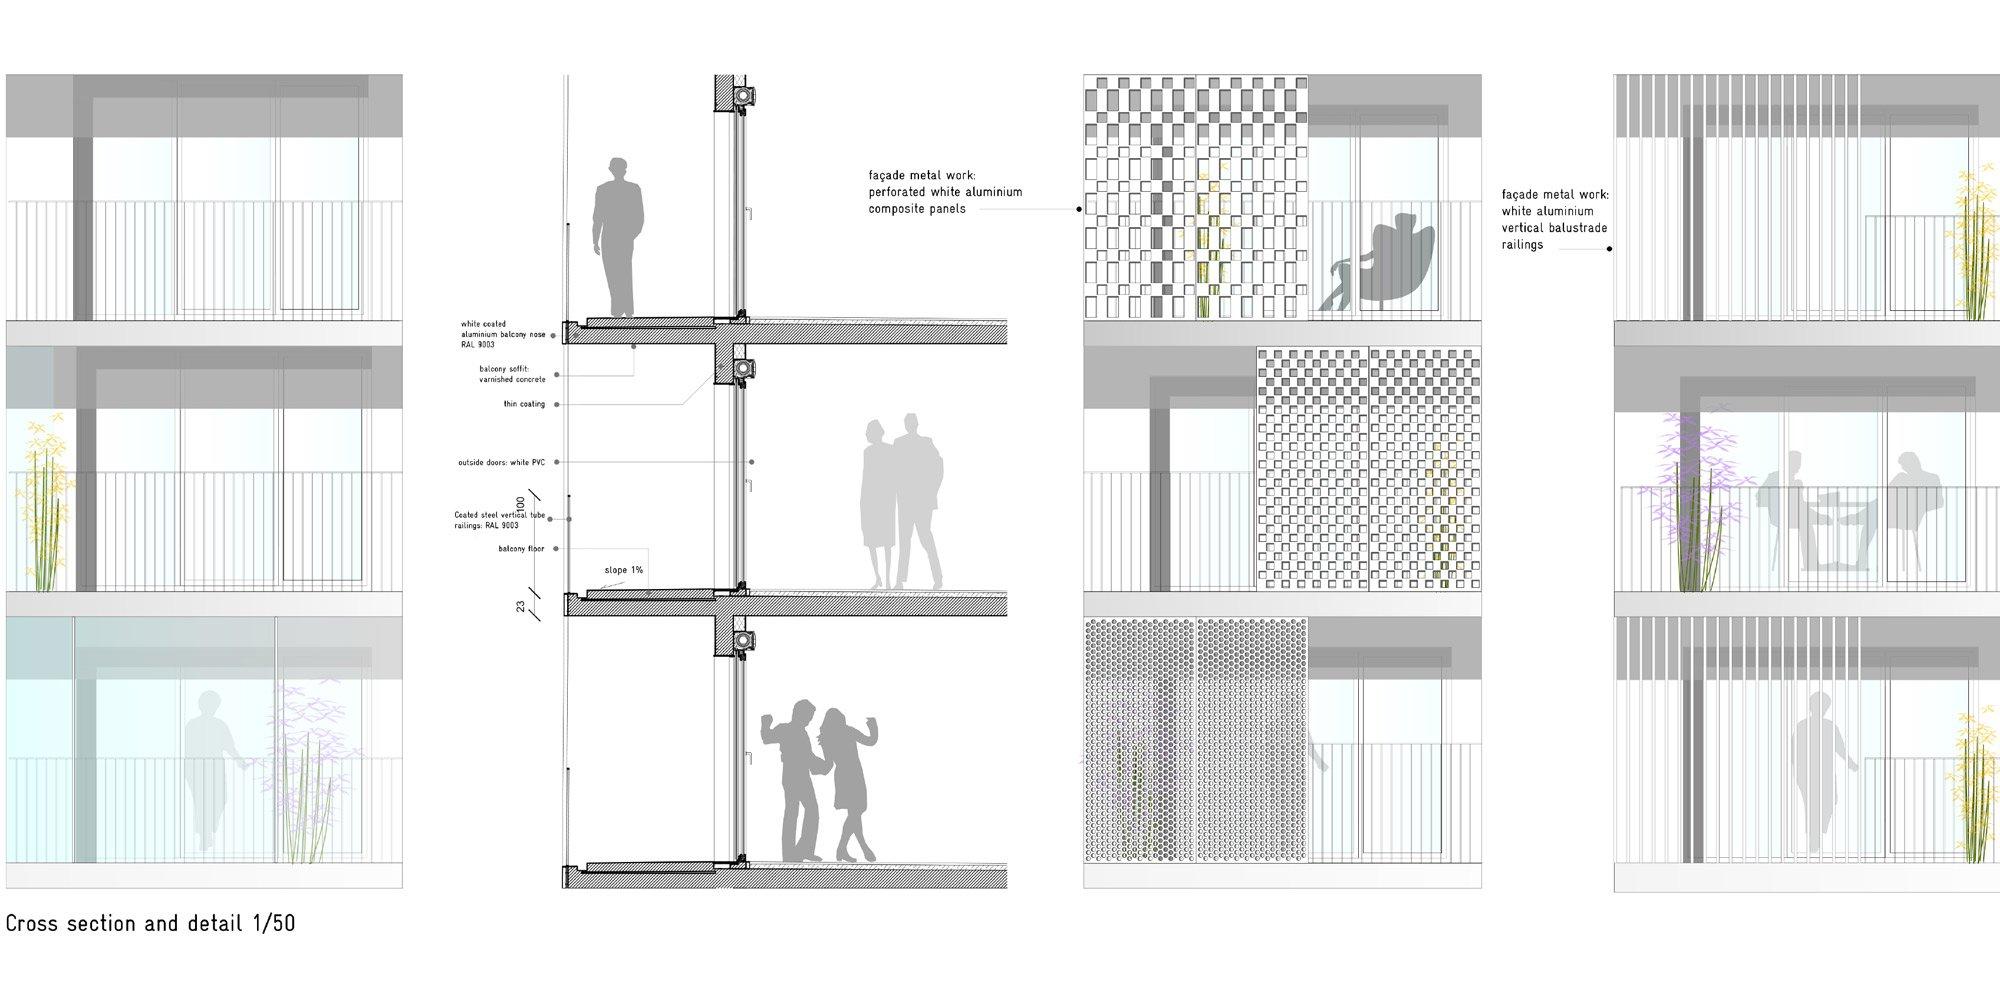 Dettaglio costruttivo © Hamonic + Masson & Associés